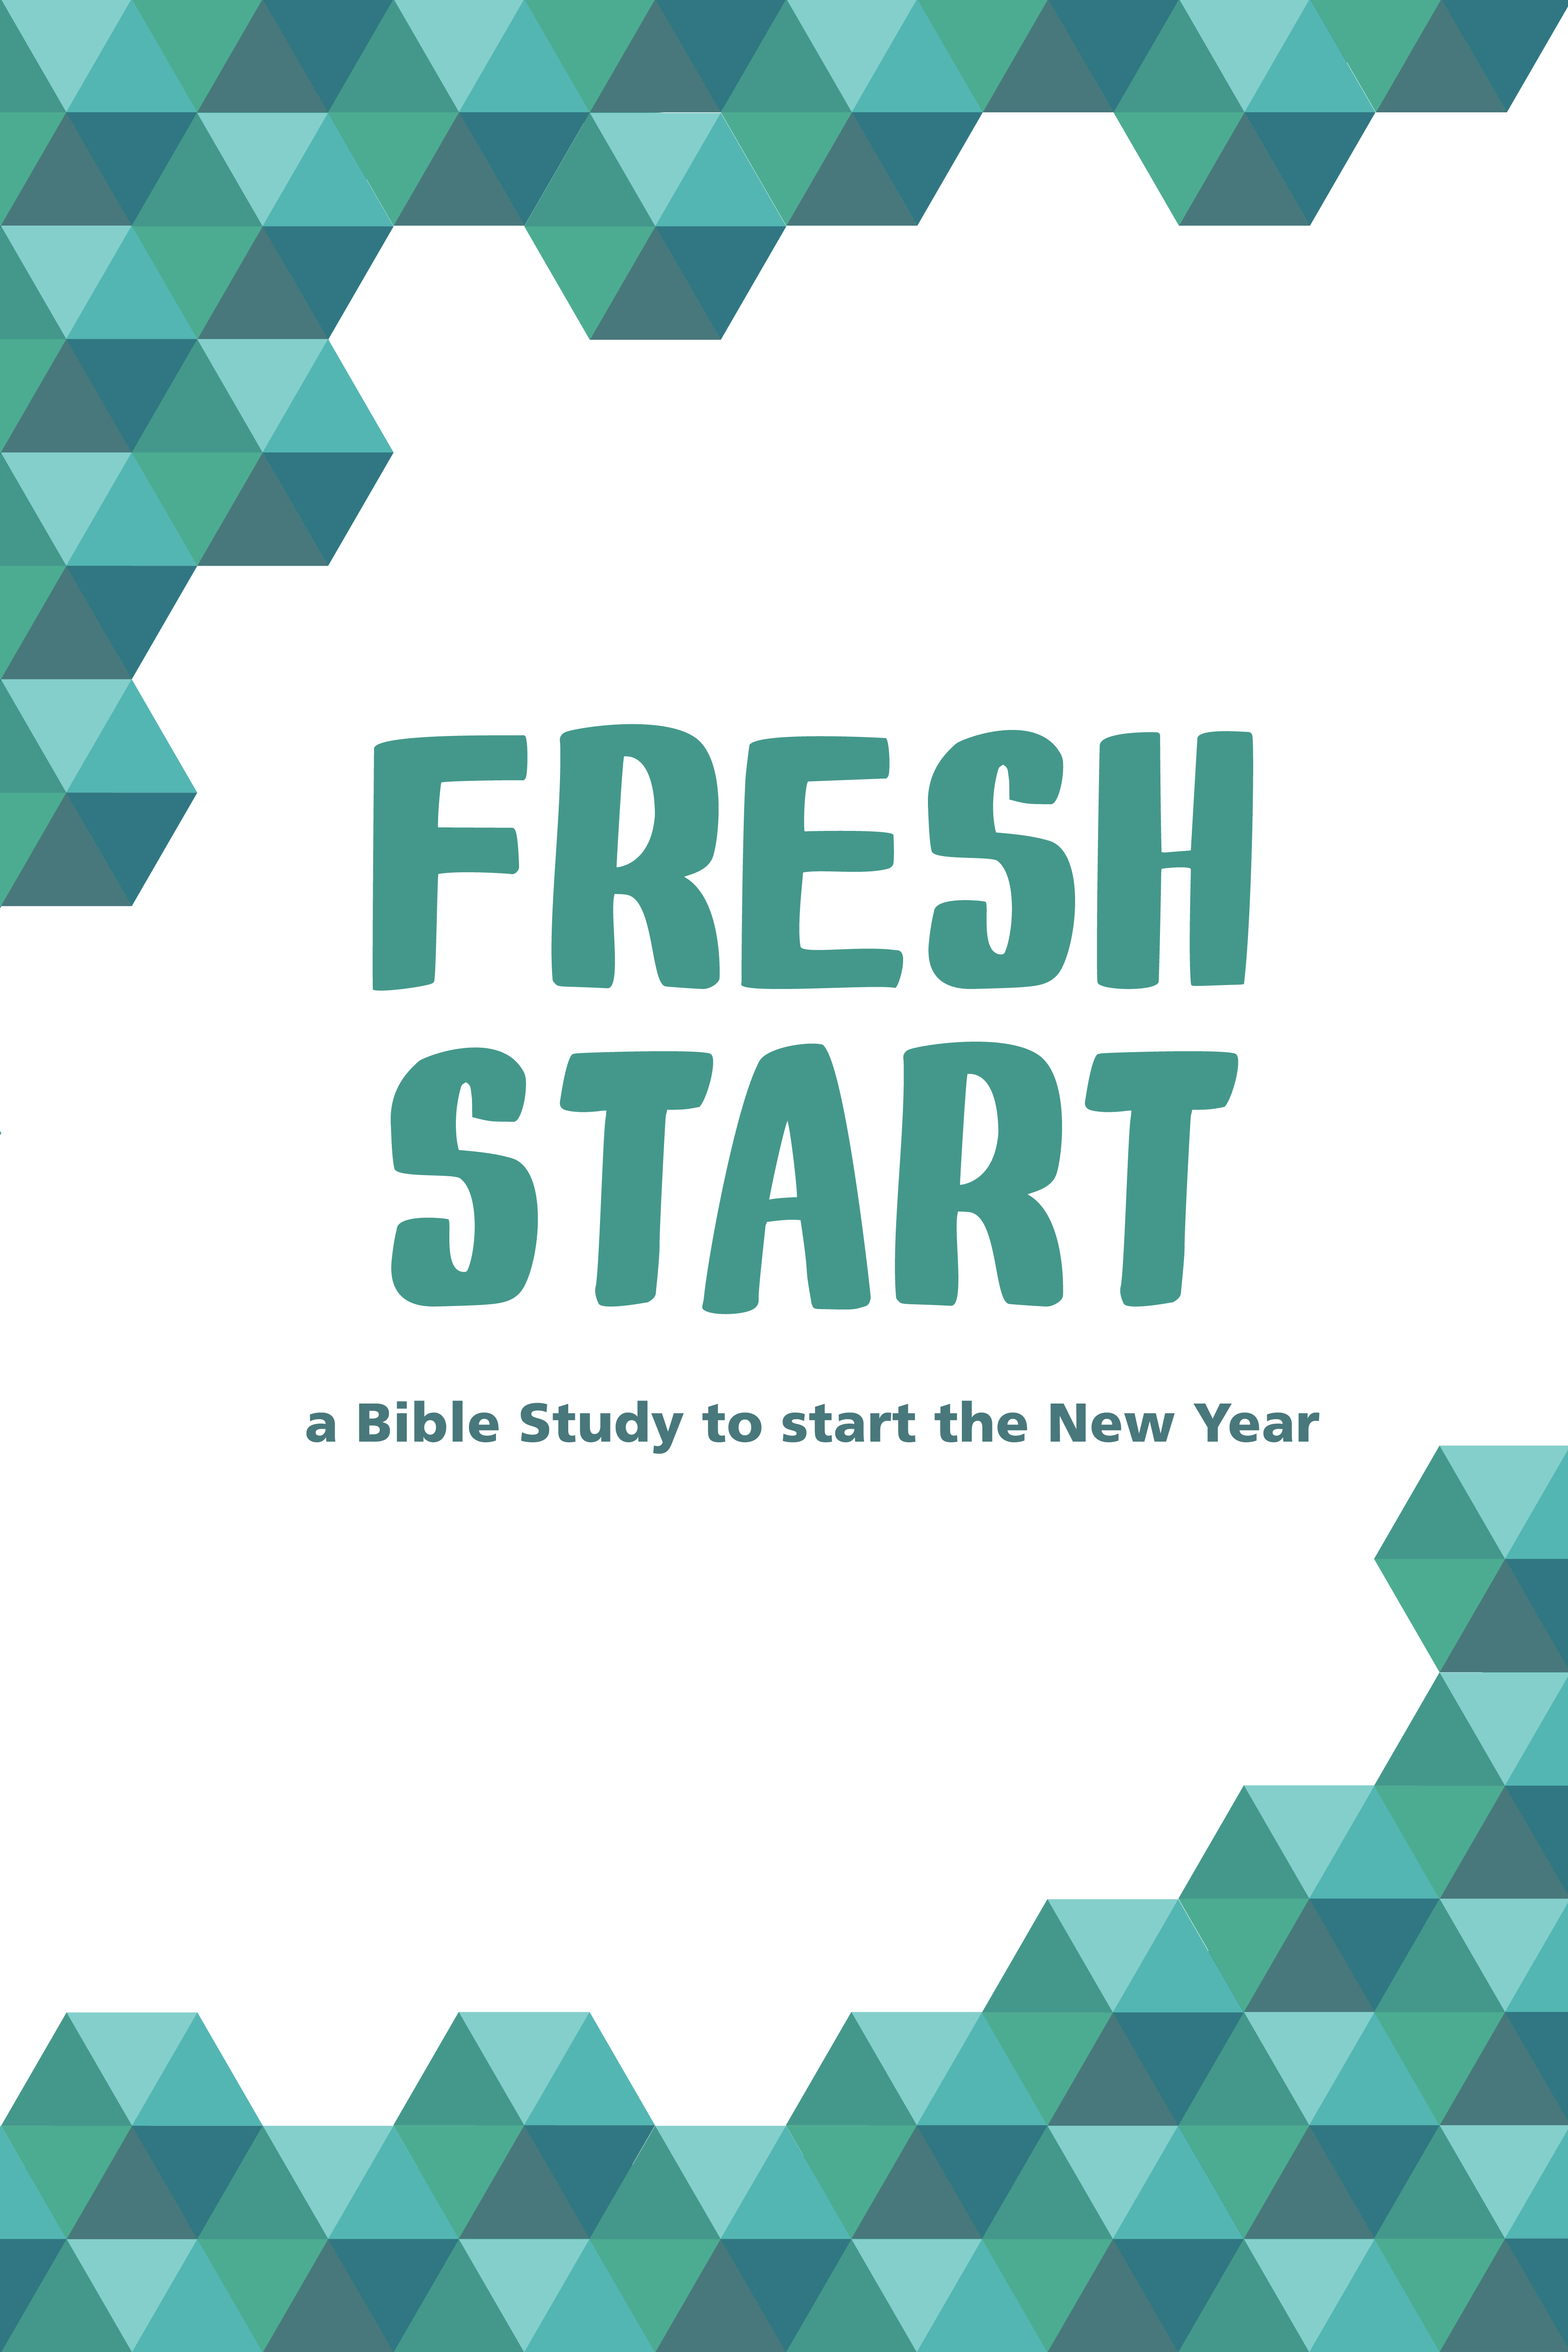 New Year Bible Study - Fresh Start | LeaderTreks Youth Ministry